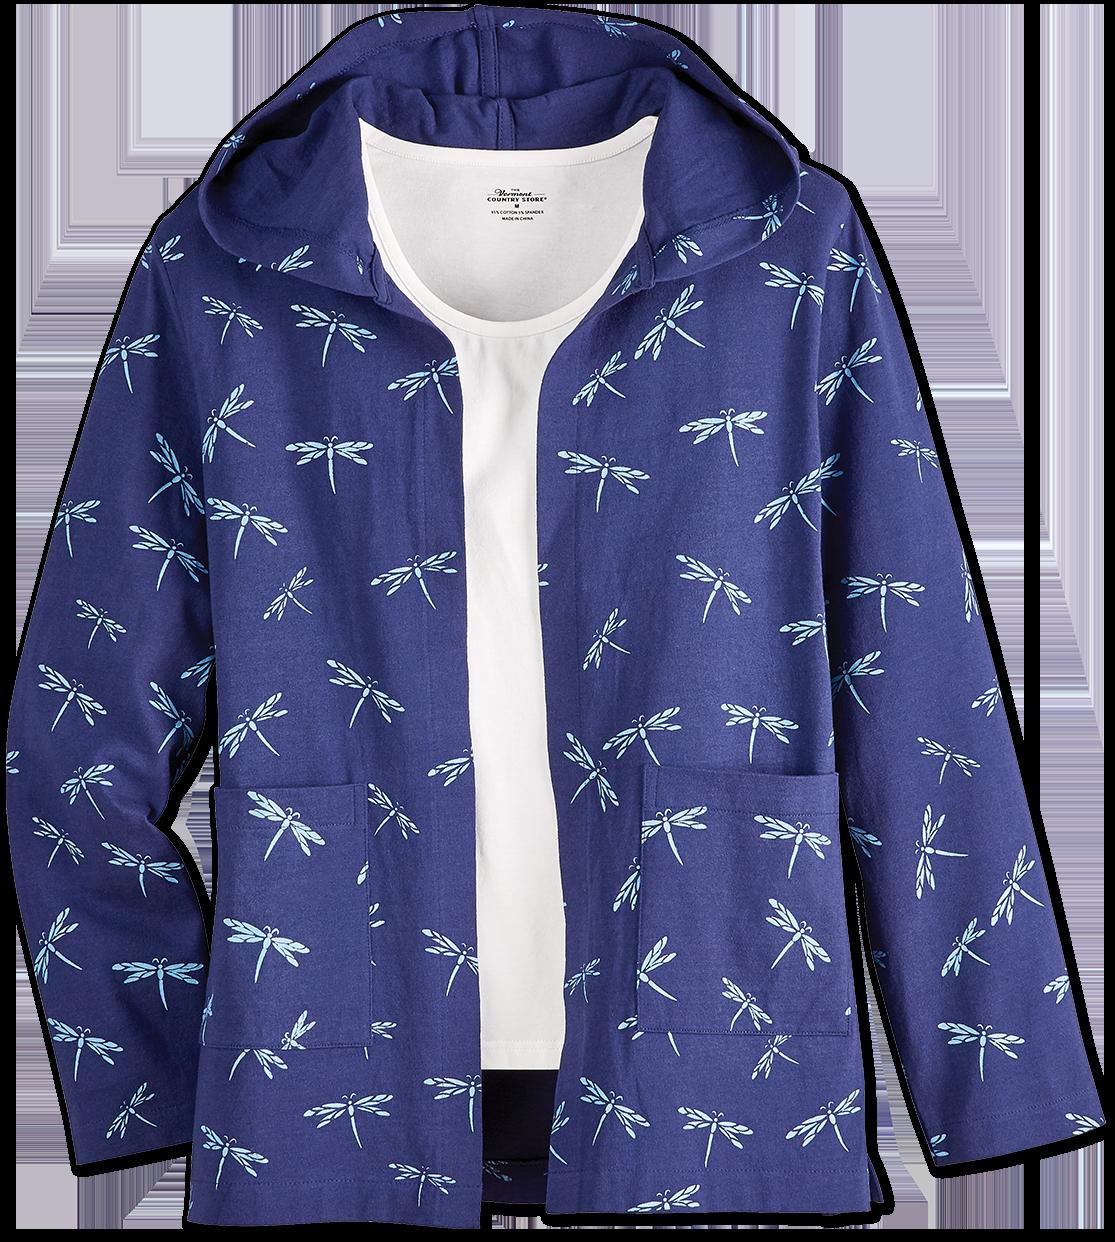 M.MAC Dragonfly Jacket